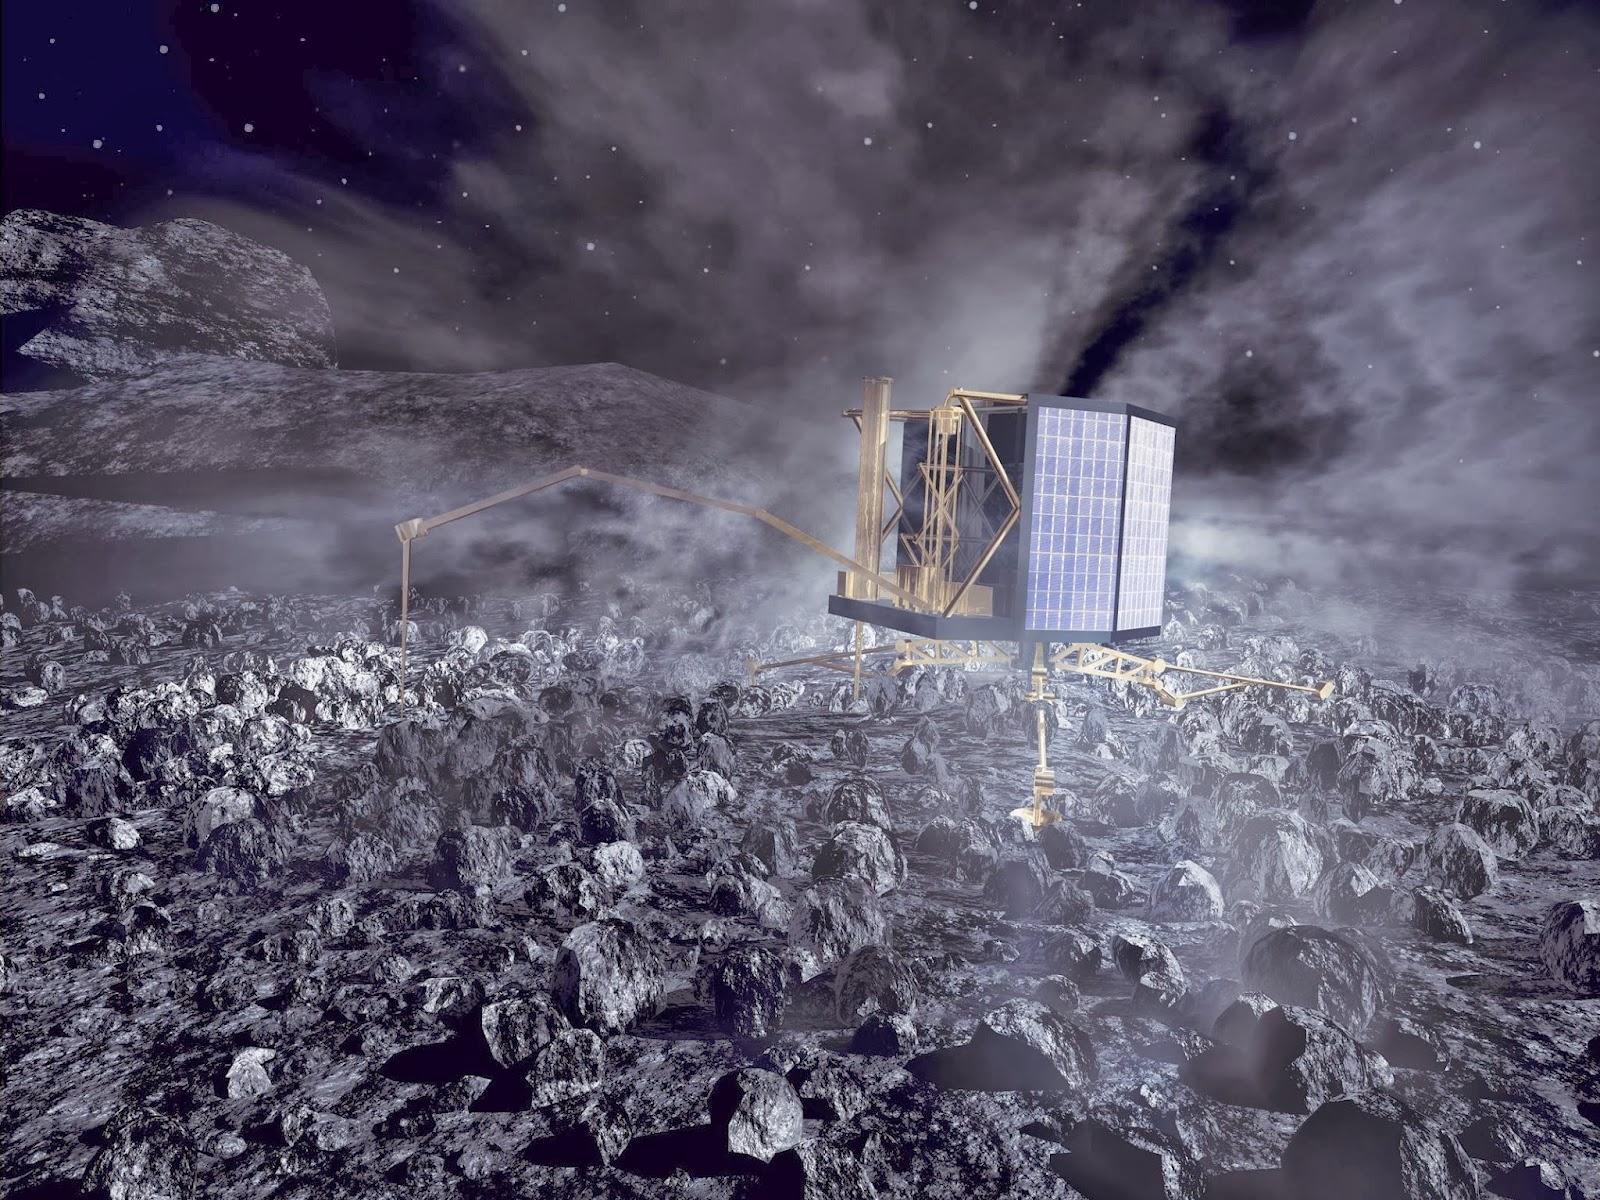 http://4.bp.blogspot.com/-jY-MzzVKHoE/UllXXonAdxI/AAAAAAAAcBU/DRzw16nDXGE/s1600/Rosetta_s_Philae_lander_on_comet_nucleus.jpg